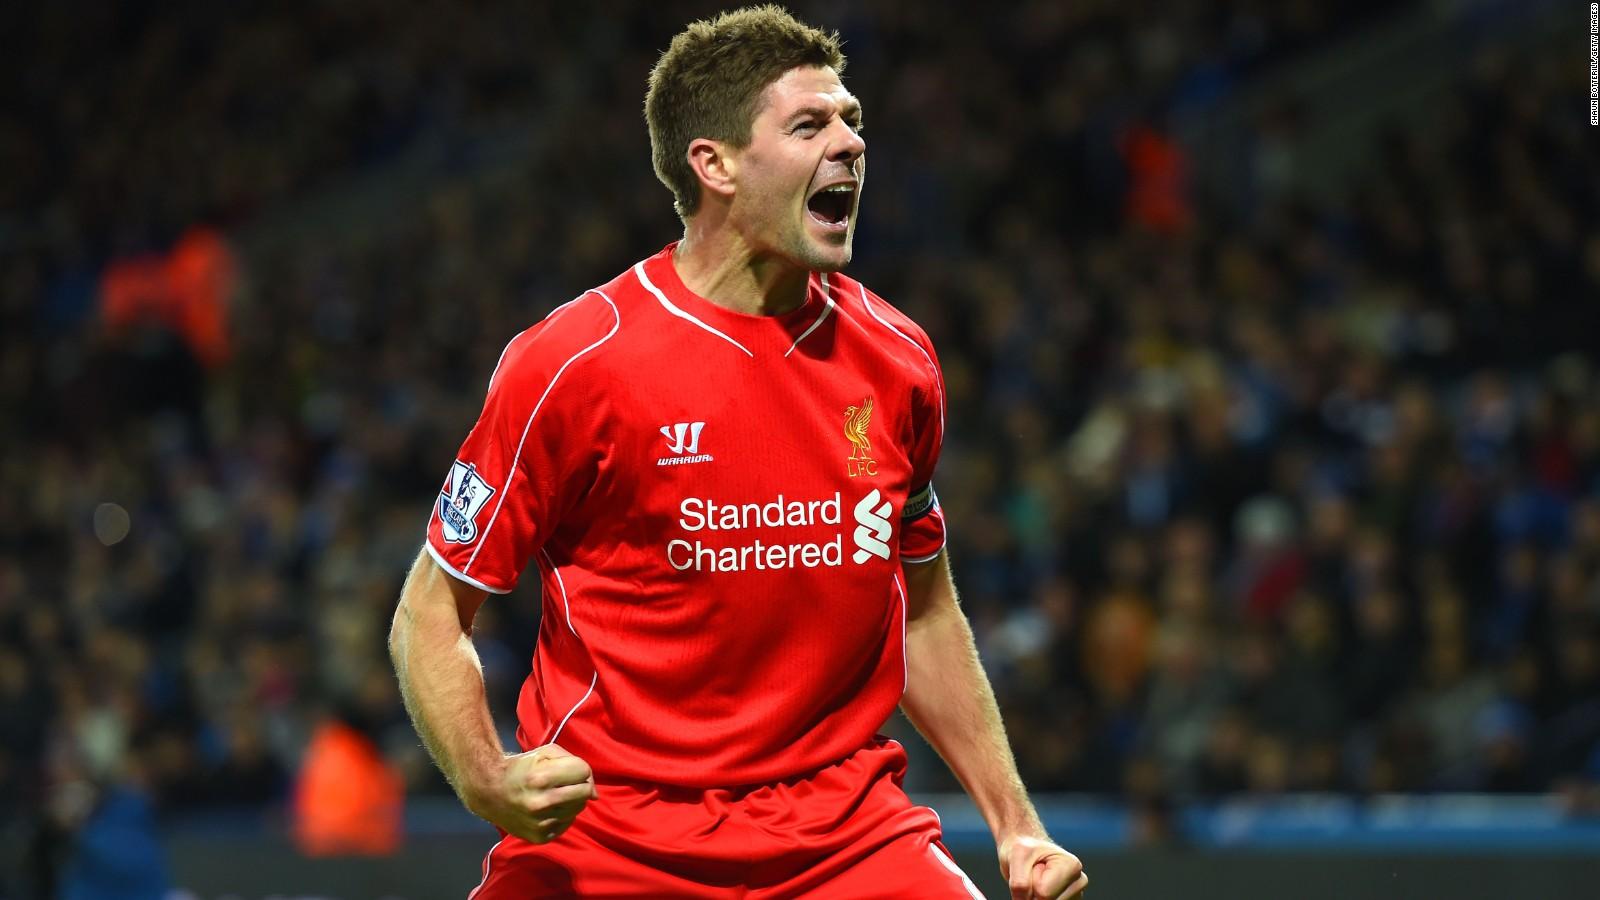 Steven Gerrard Former England Liverpool captain retires CNN